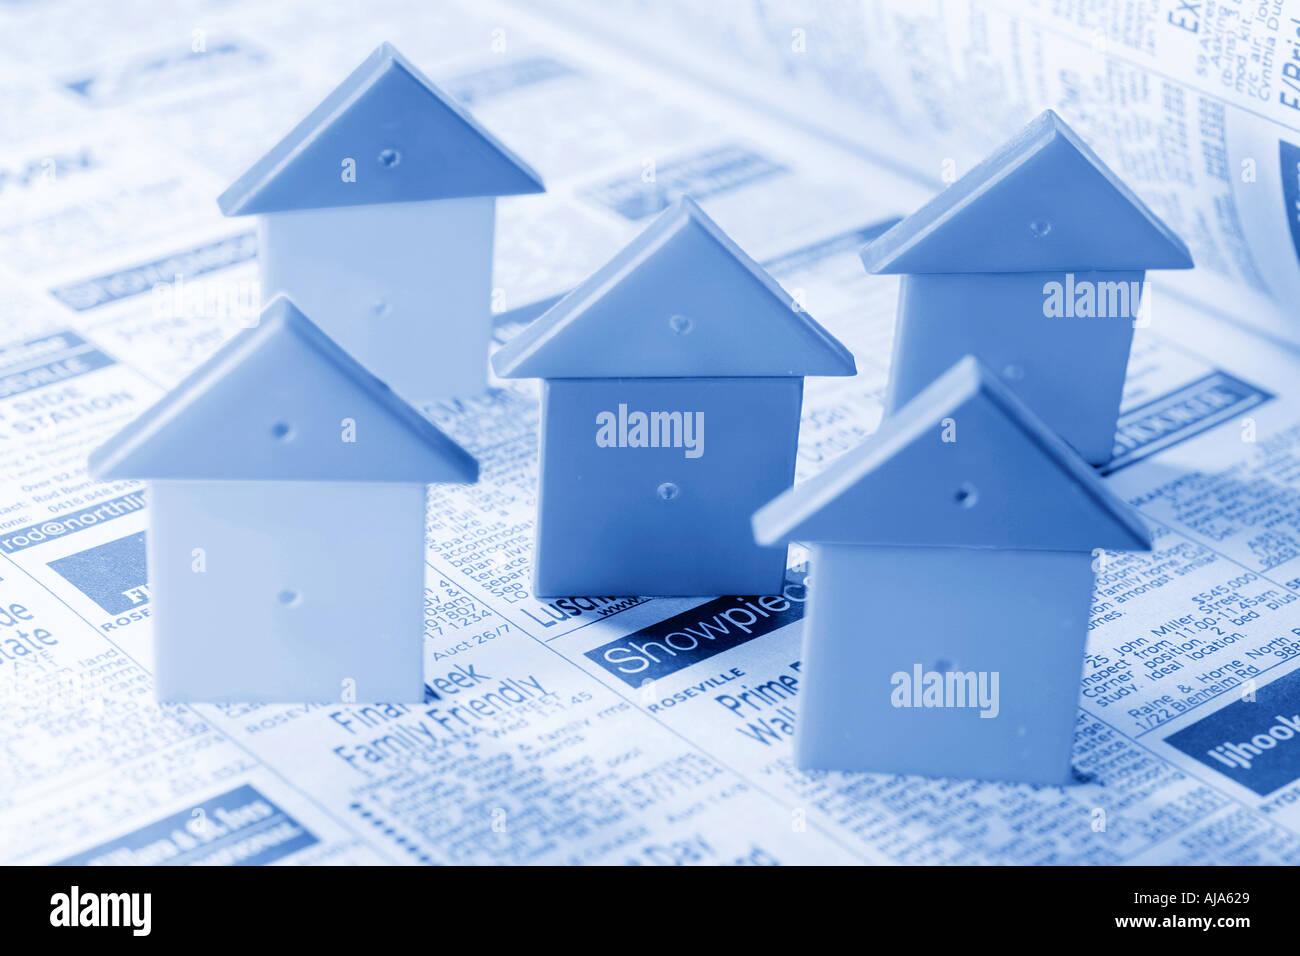 Miniature House Symbols On Real Estate Advertisements Stock Photo